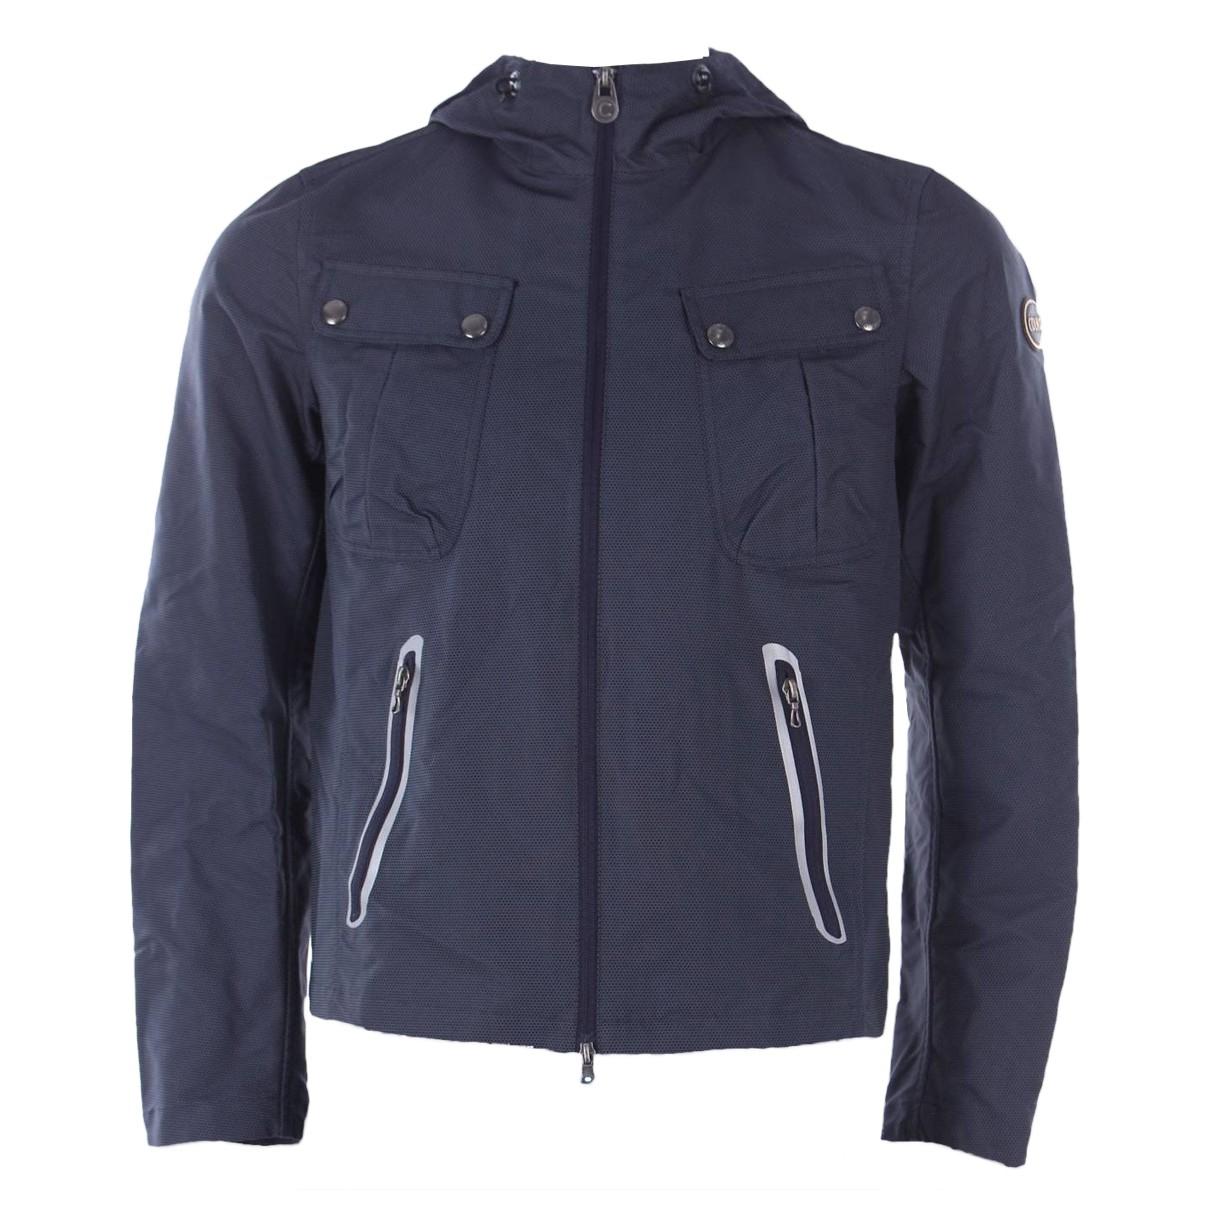 Colmar \N Navy jacket  for Men 48 IT